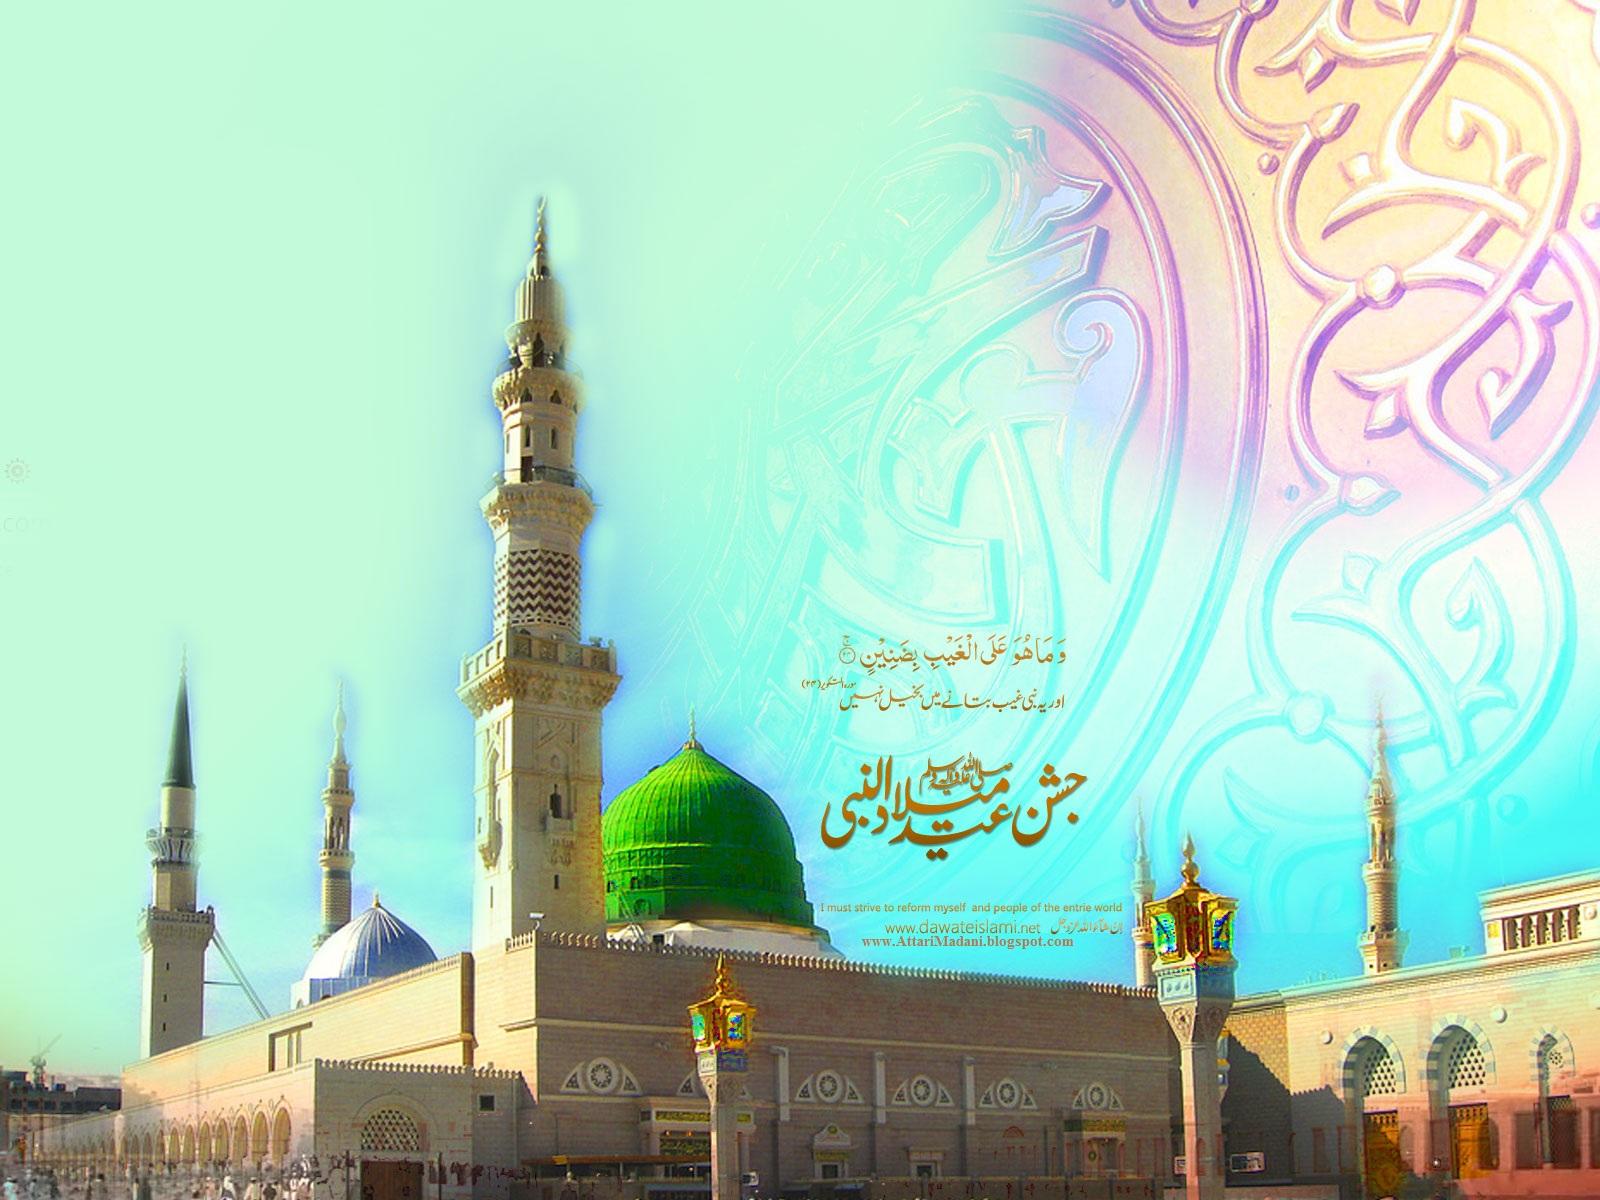 http://2.bp.blogspot.com/-IkNQ5PVm0eg/Tx7yH2ThaLI/AAAAAAAAA7Y/35EhtOYiPW0/s1600/jashn_e_eid_milad_un_nabi_wallpaper_by_dawat_e_islami-8.jpg